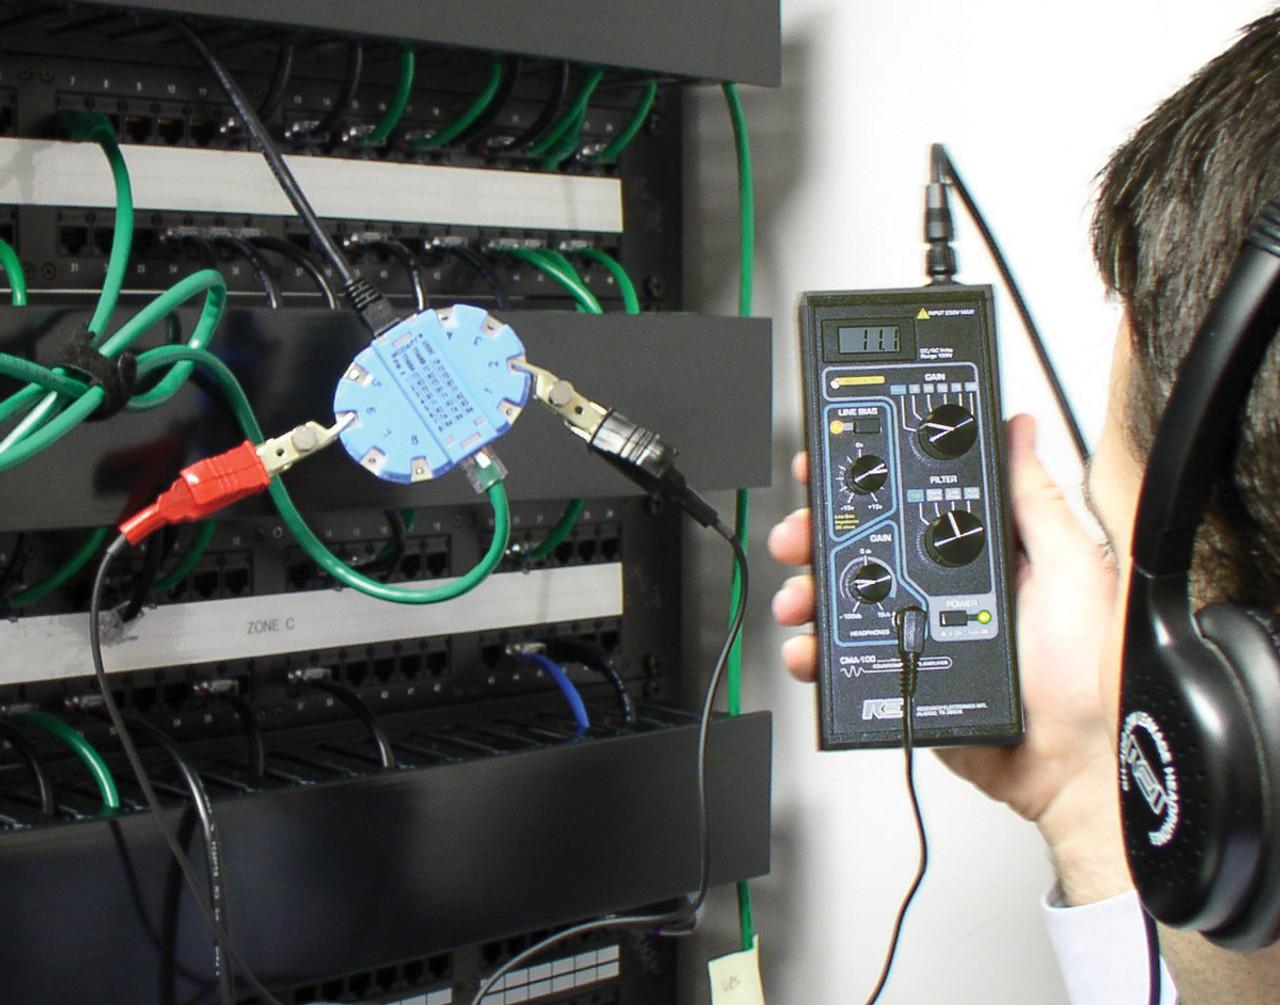 CMA-100 Countermeasures Amplifier